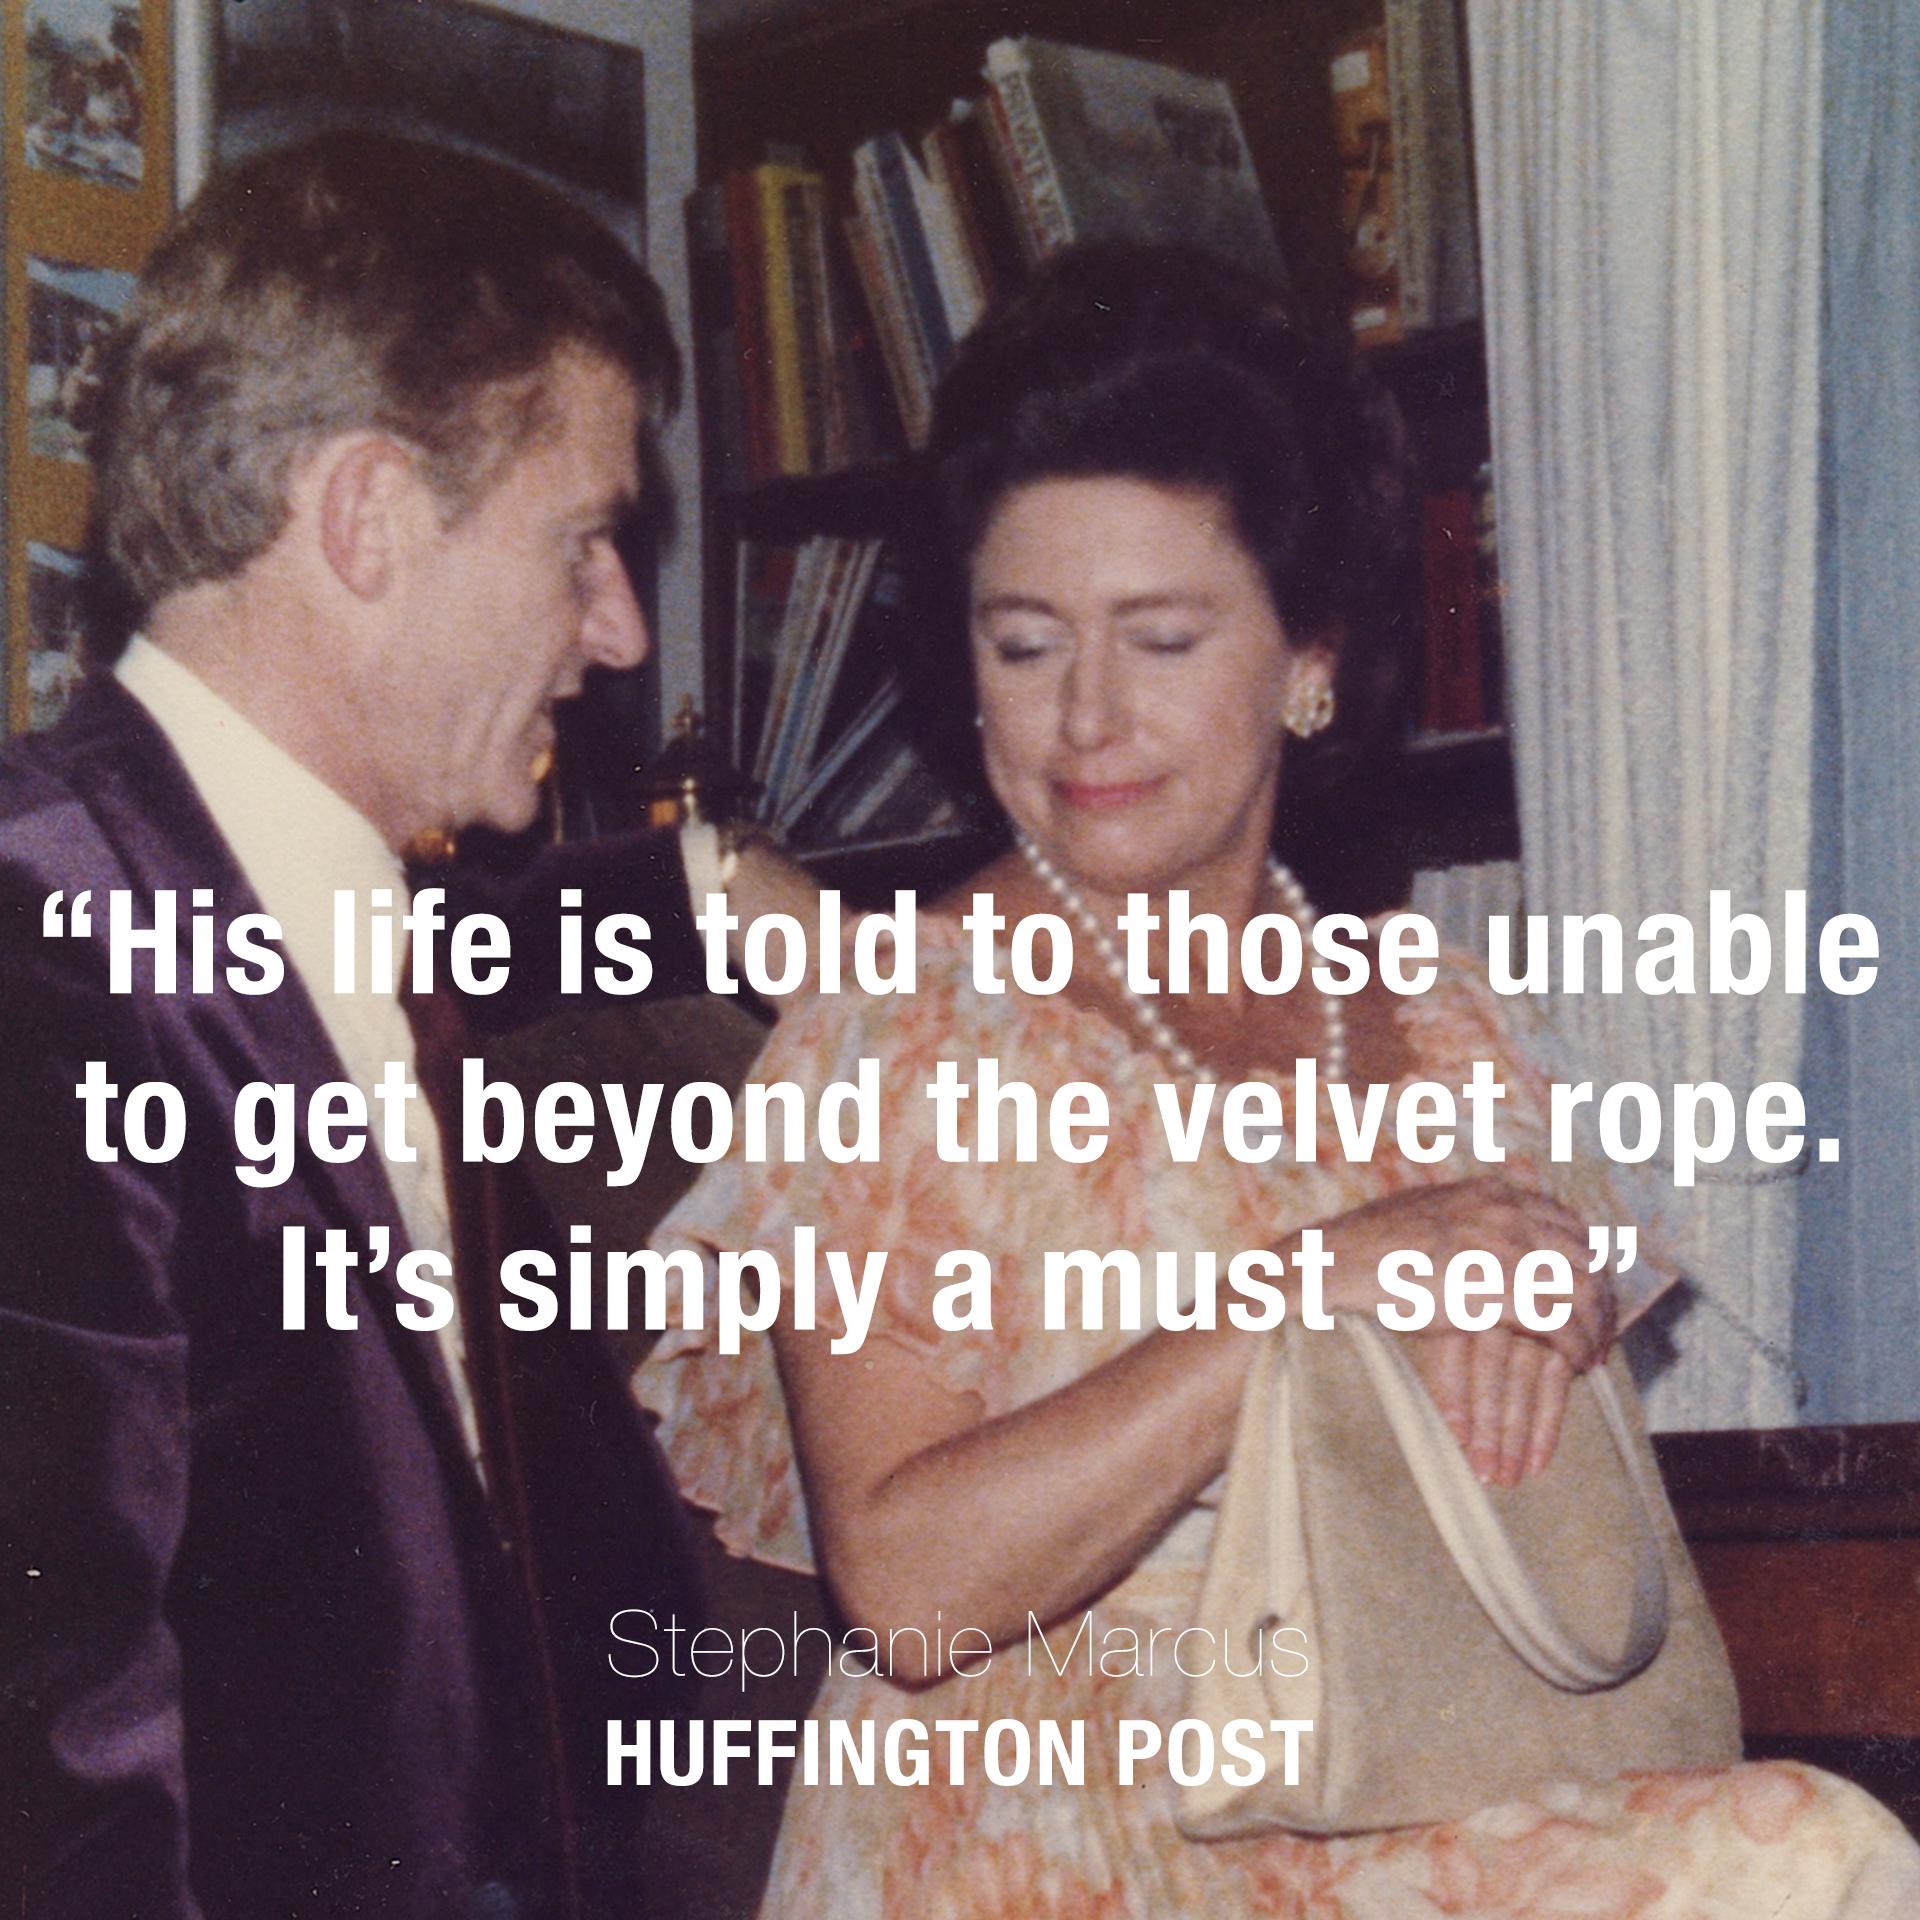 2014-10-01 The Huffington Post .jpg